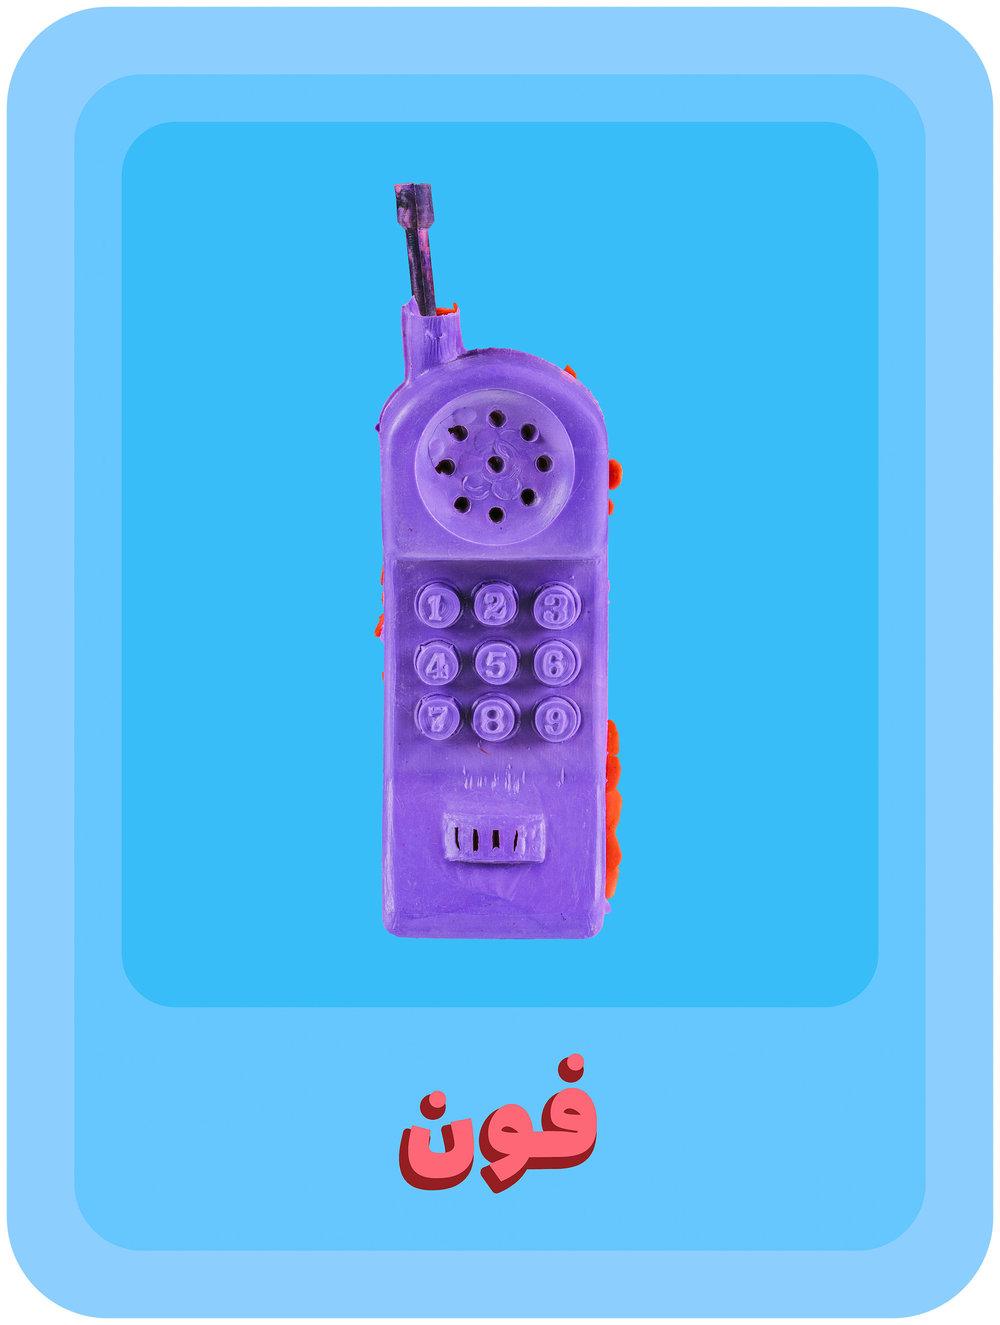 Mobile Phone #2 3000dpi.jpg